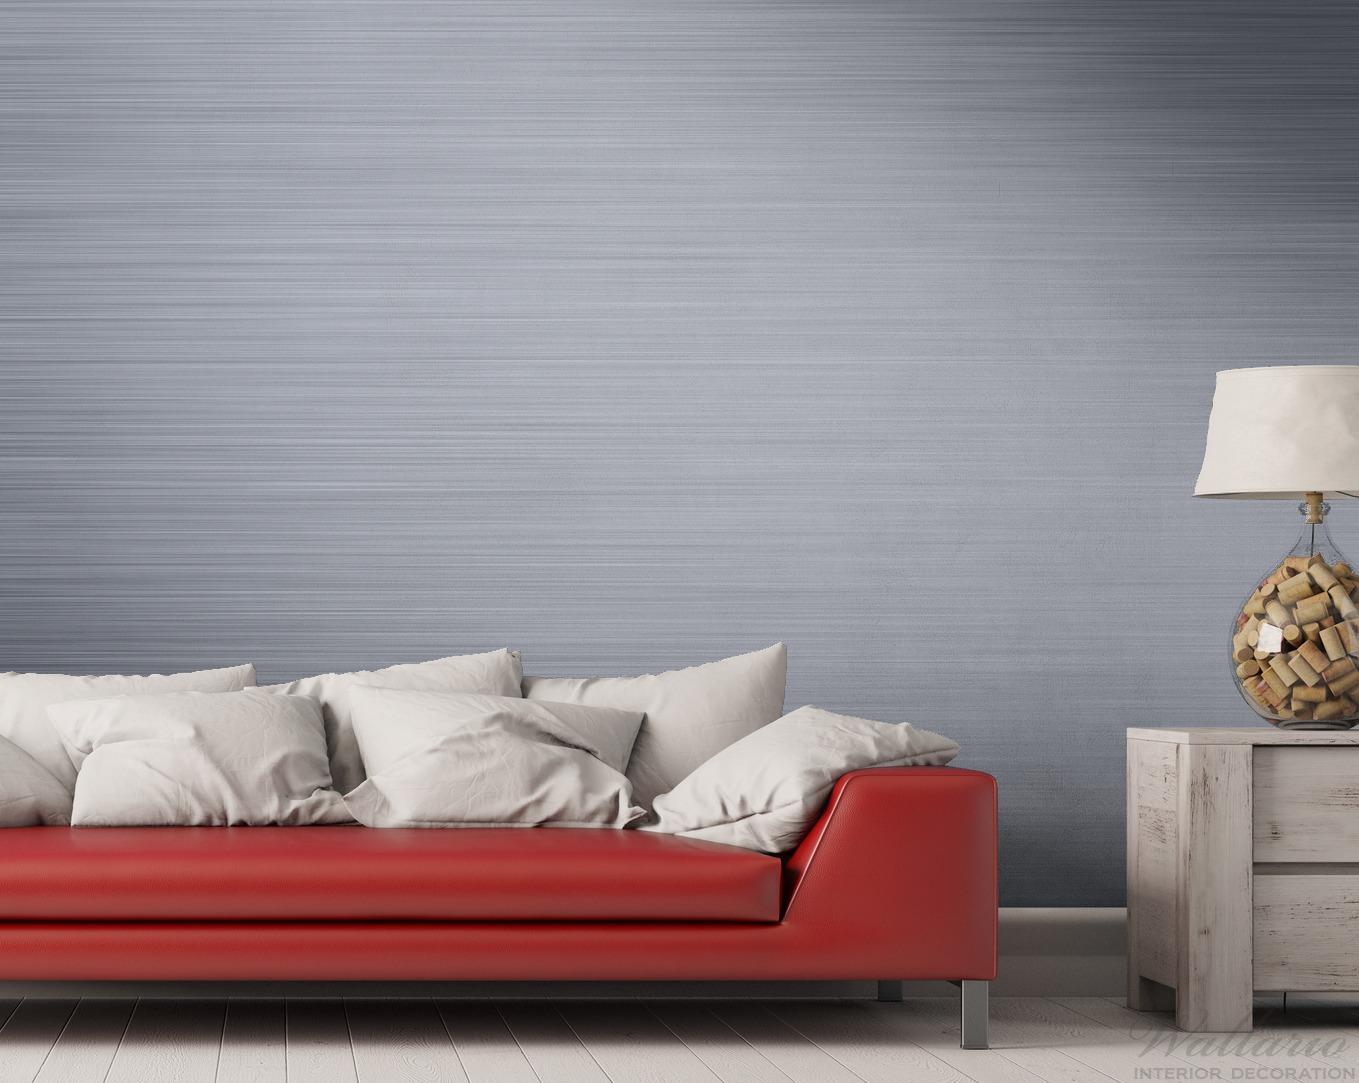 Vliestapete Aluminium-Optik Metall-Optik Streifen – Bild 2